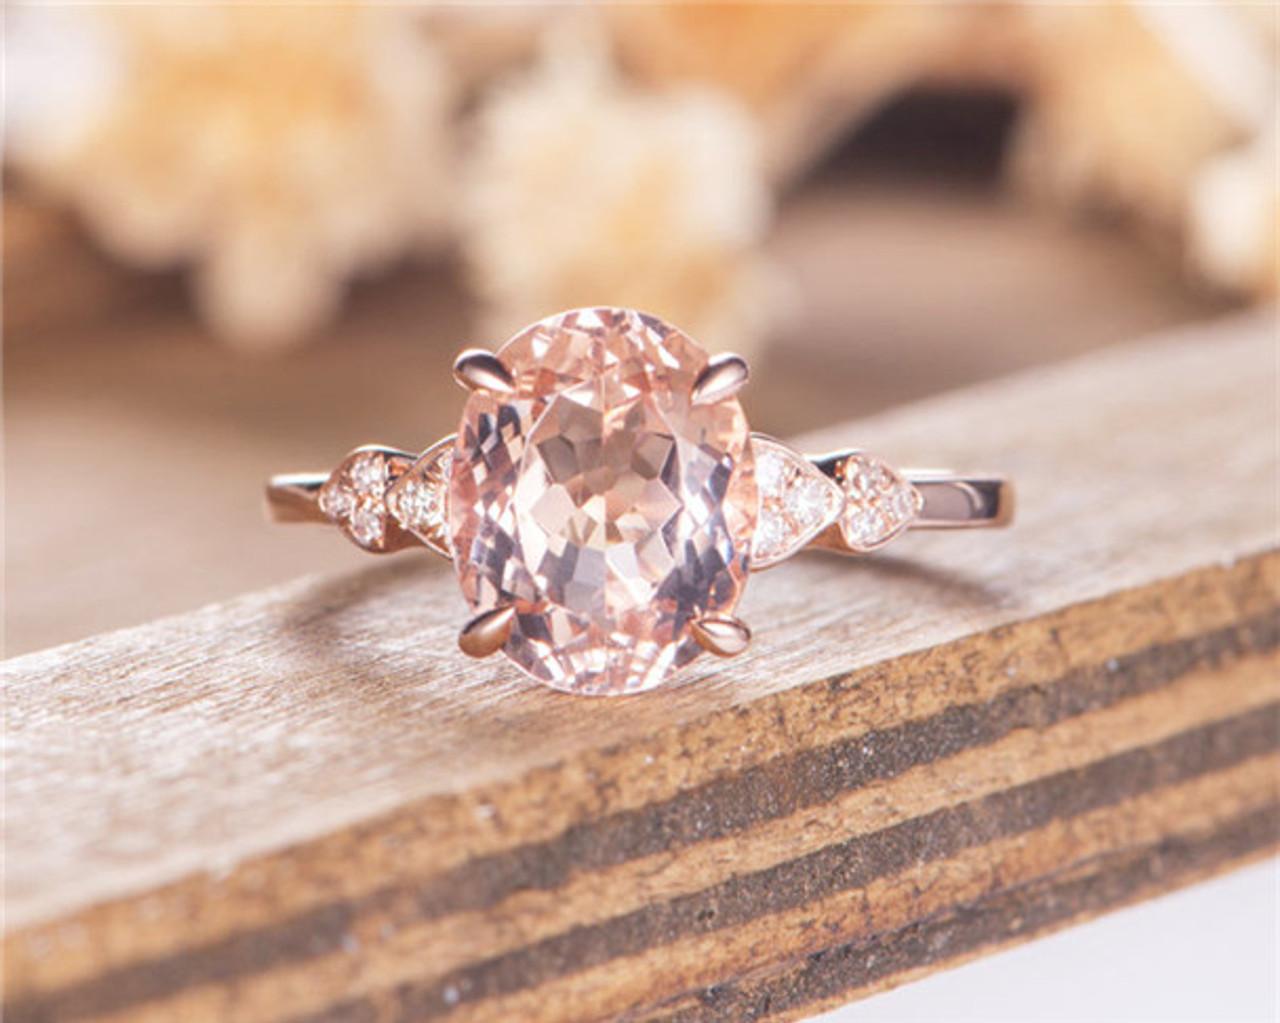 Unique Wedding Ring.Morganite Engagement Ring Rose Gold Bridal Ring Oval Cut Half Eternity Diamond Heart Shaped Unique Wedding Ring